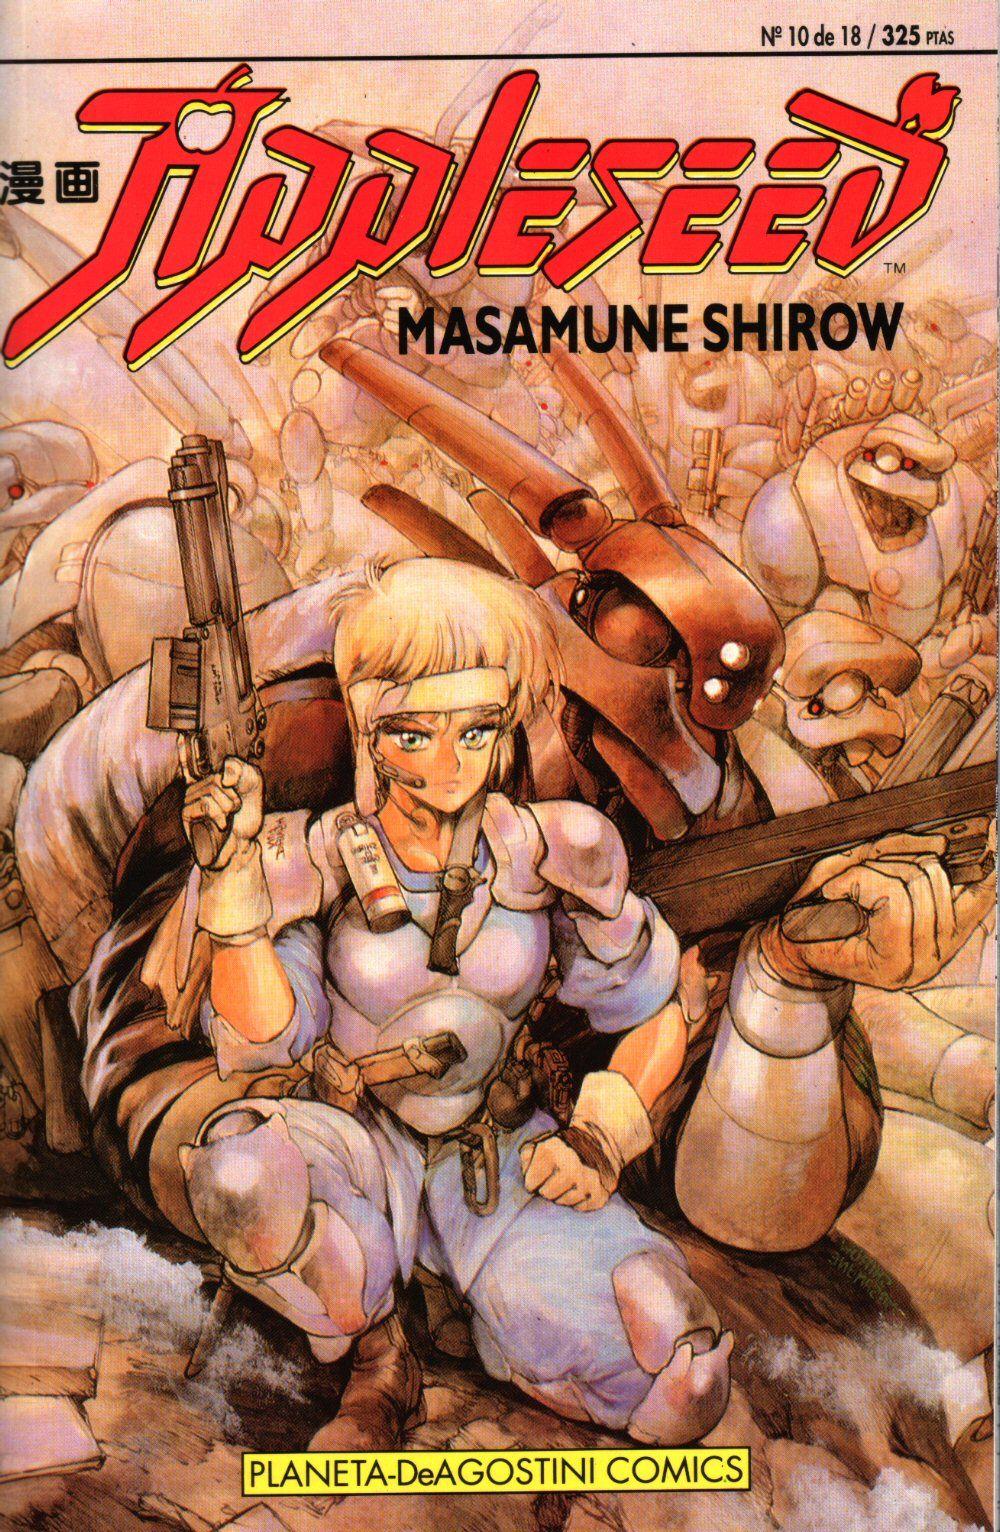 Appleseed 10 Gracias A Nadeshiko Fansub Masamune Shirow Anime Anime Japan